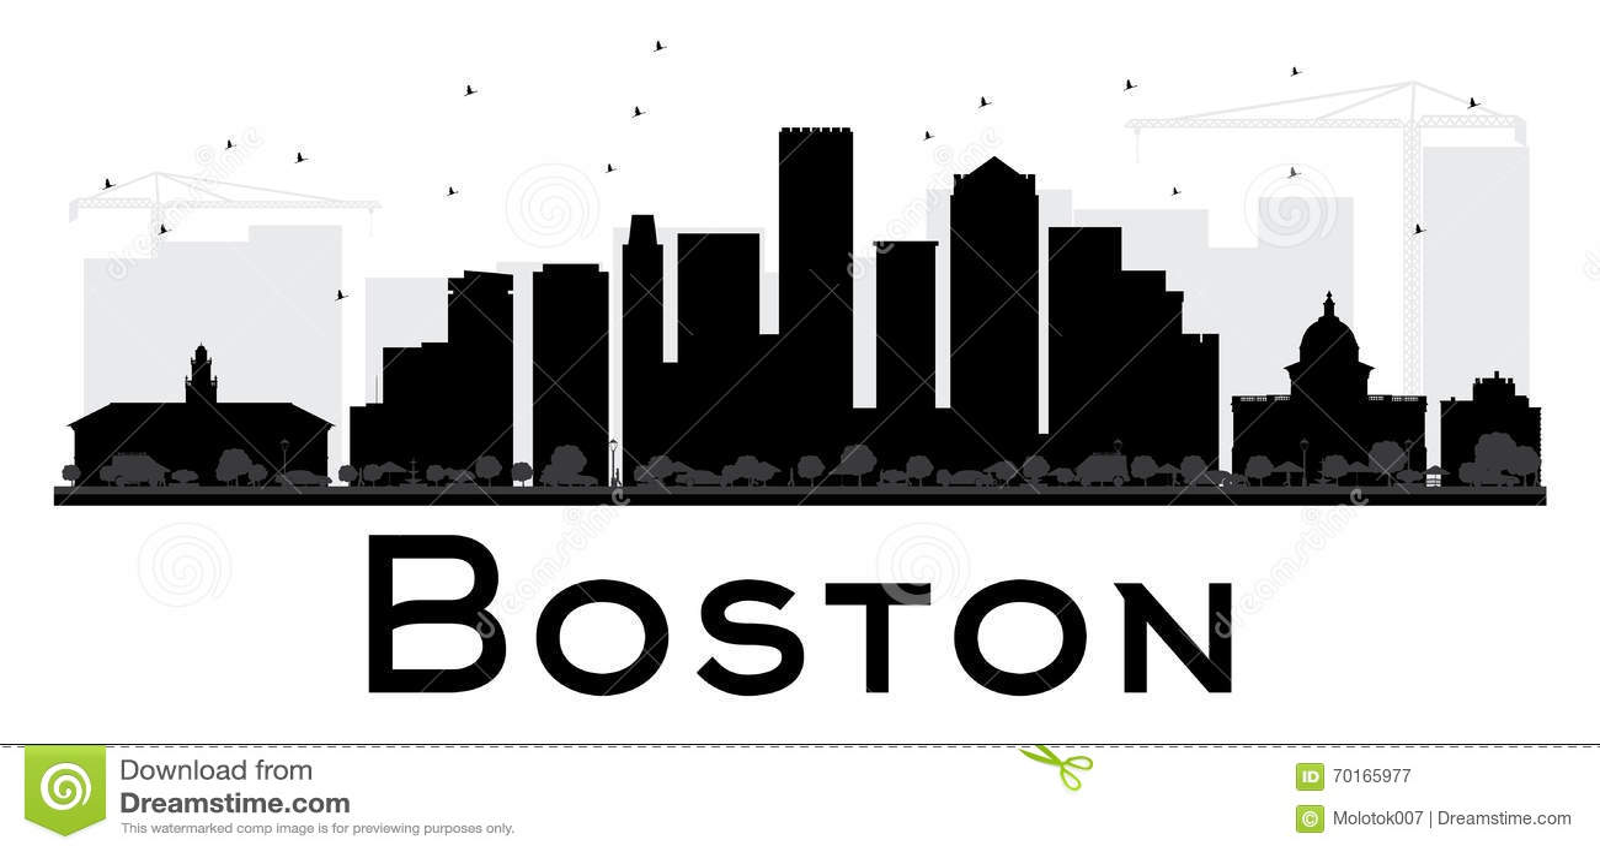 Boston City Skyline Black And White Silhouette Stock